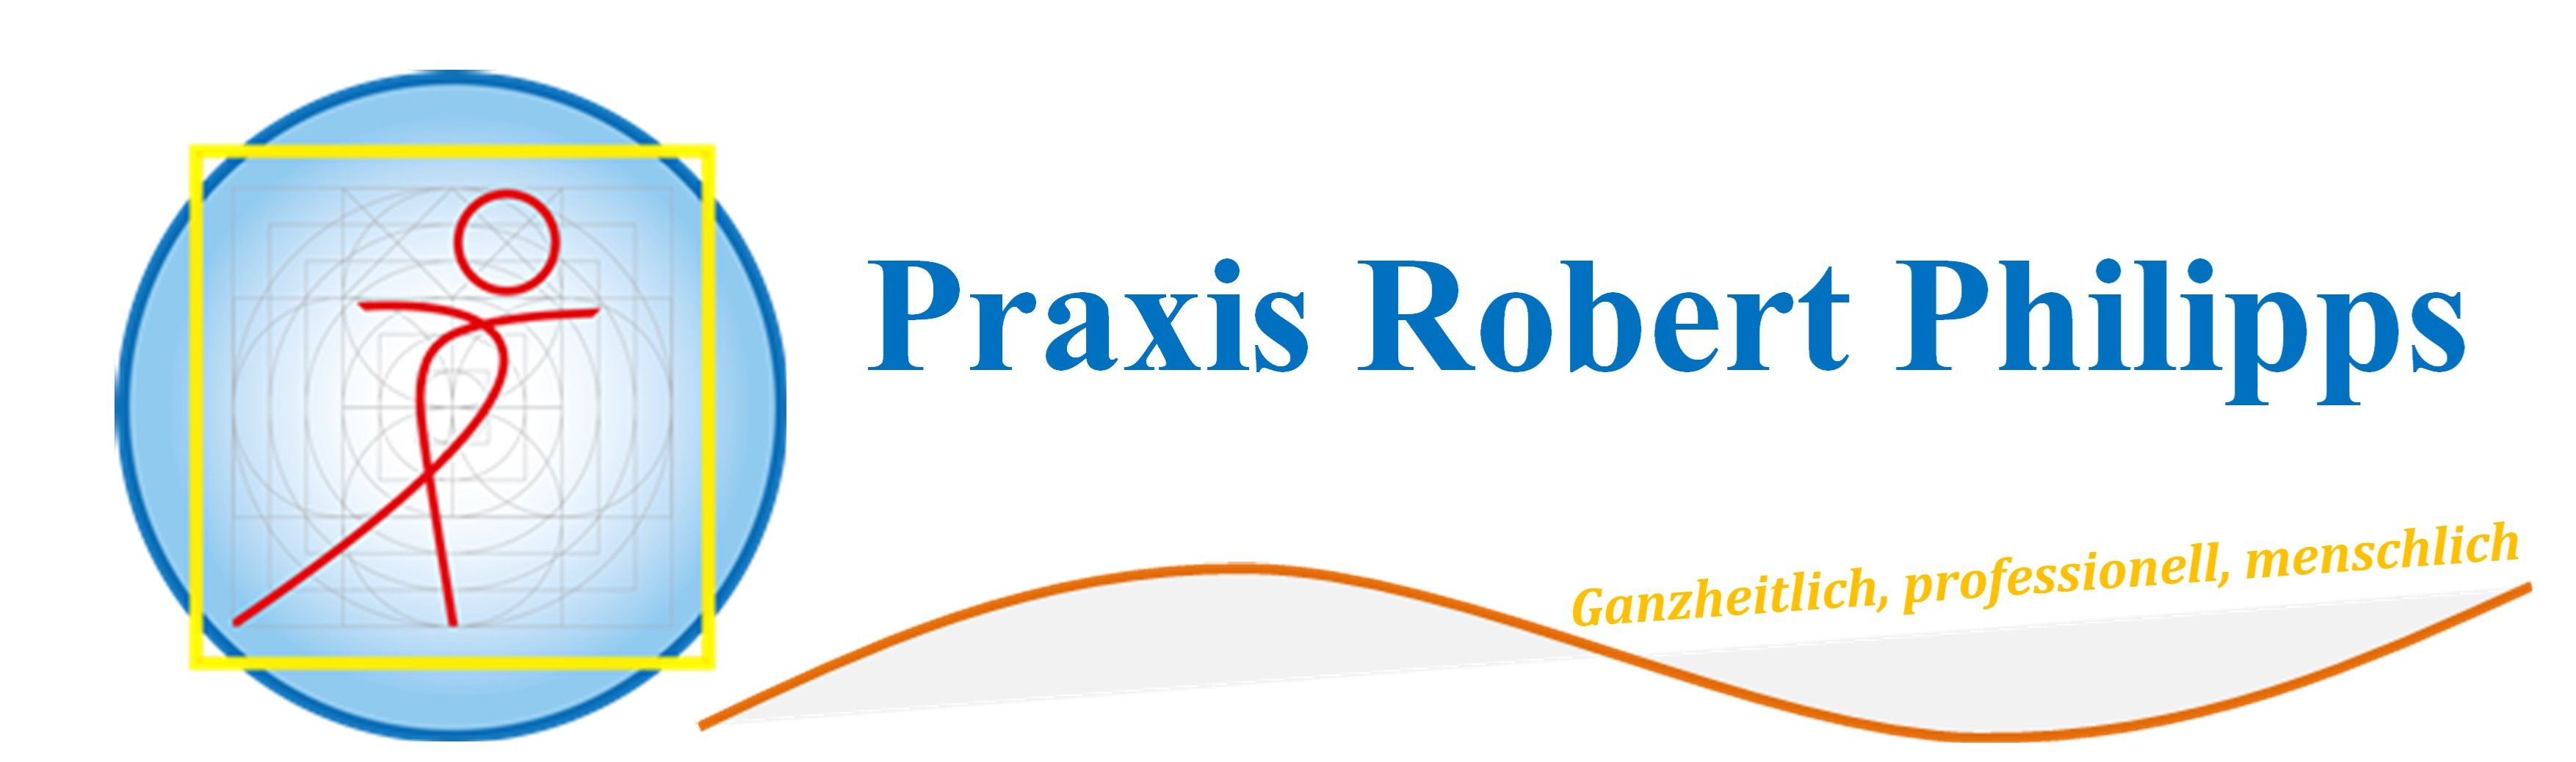 Praxis Robert Philipps